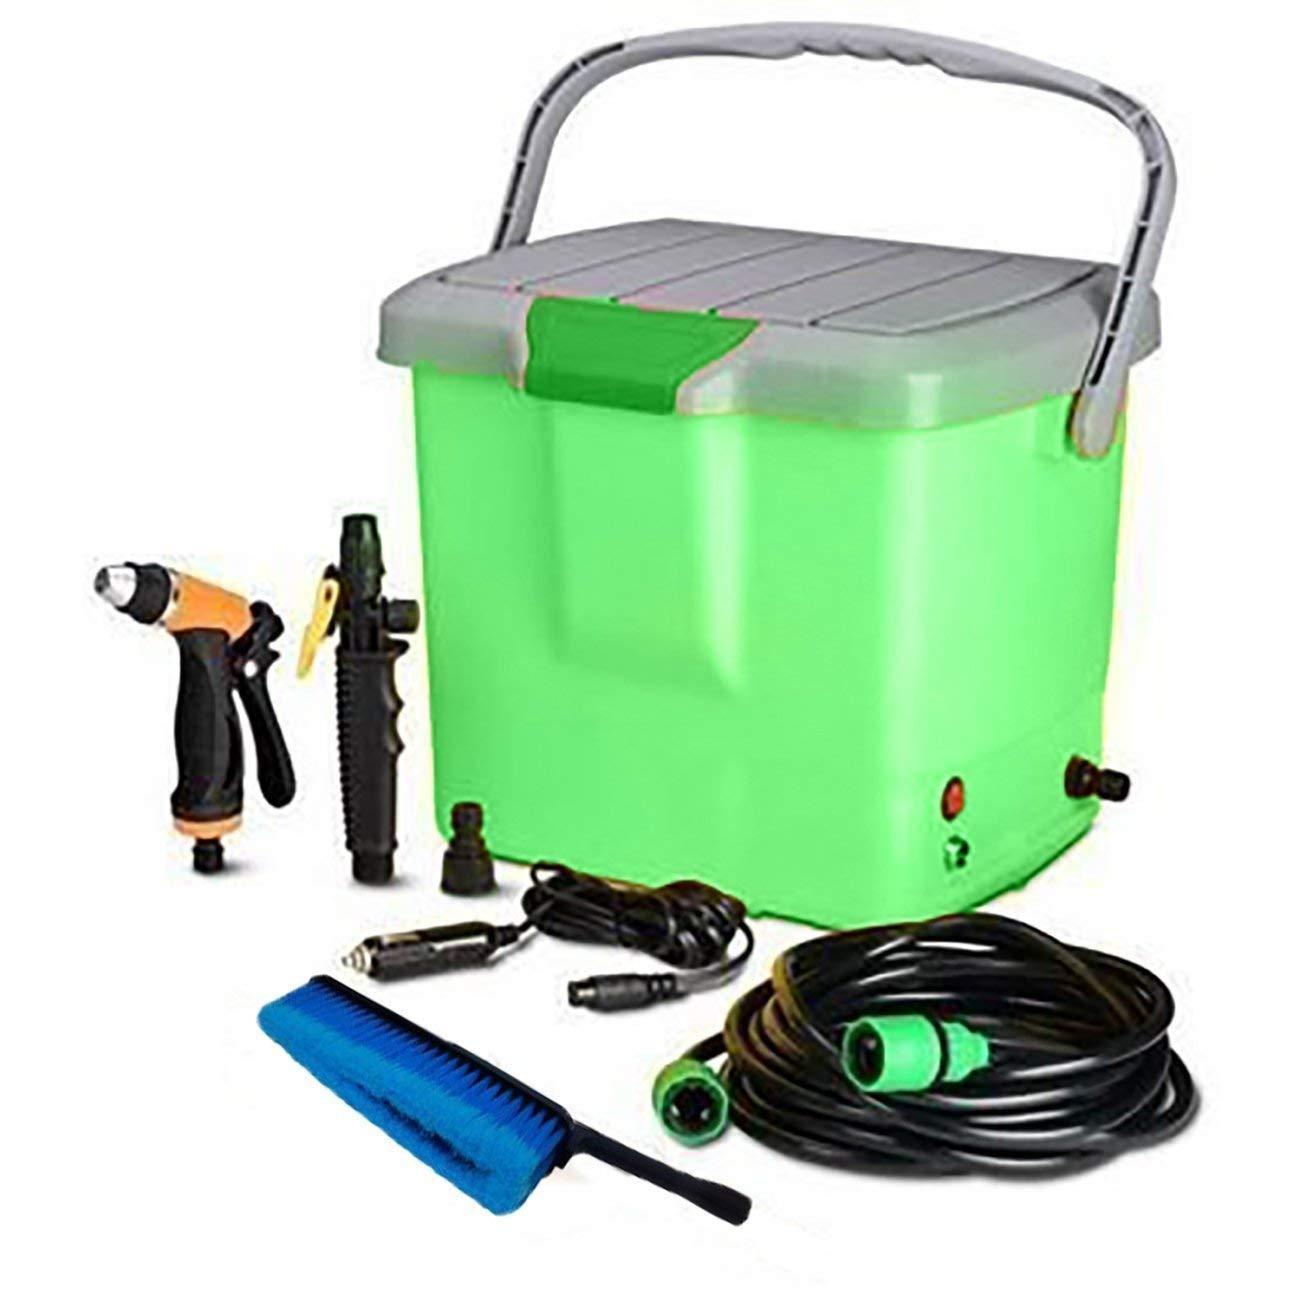 SHOPPOWORLD High Pressure Portable Car Washer With Electric clean Spray  Gun, High Pressure water Pump, Brush, Storage Box, High Pressure Wand  Perfect